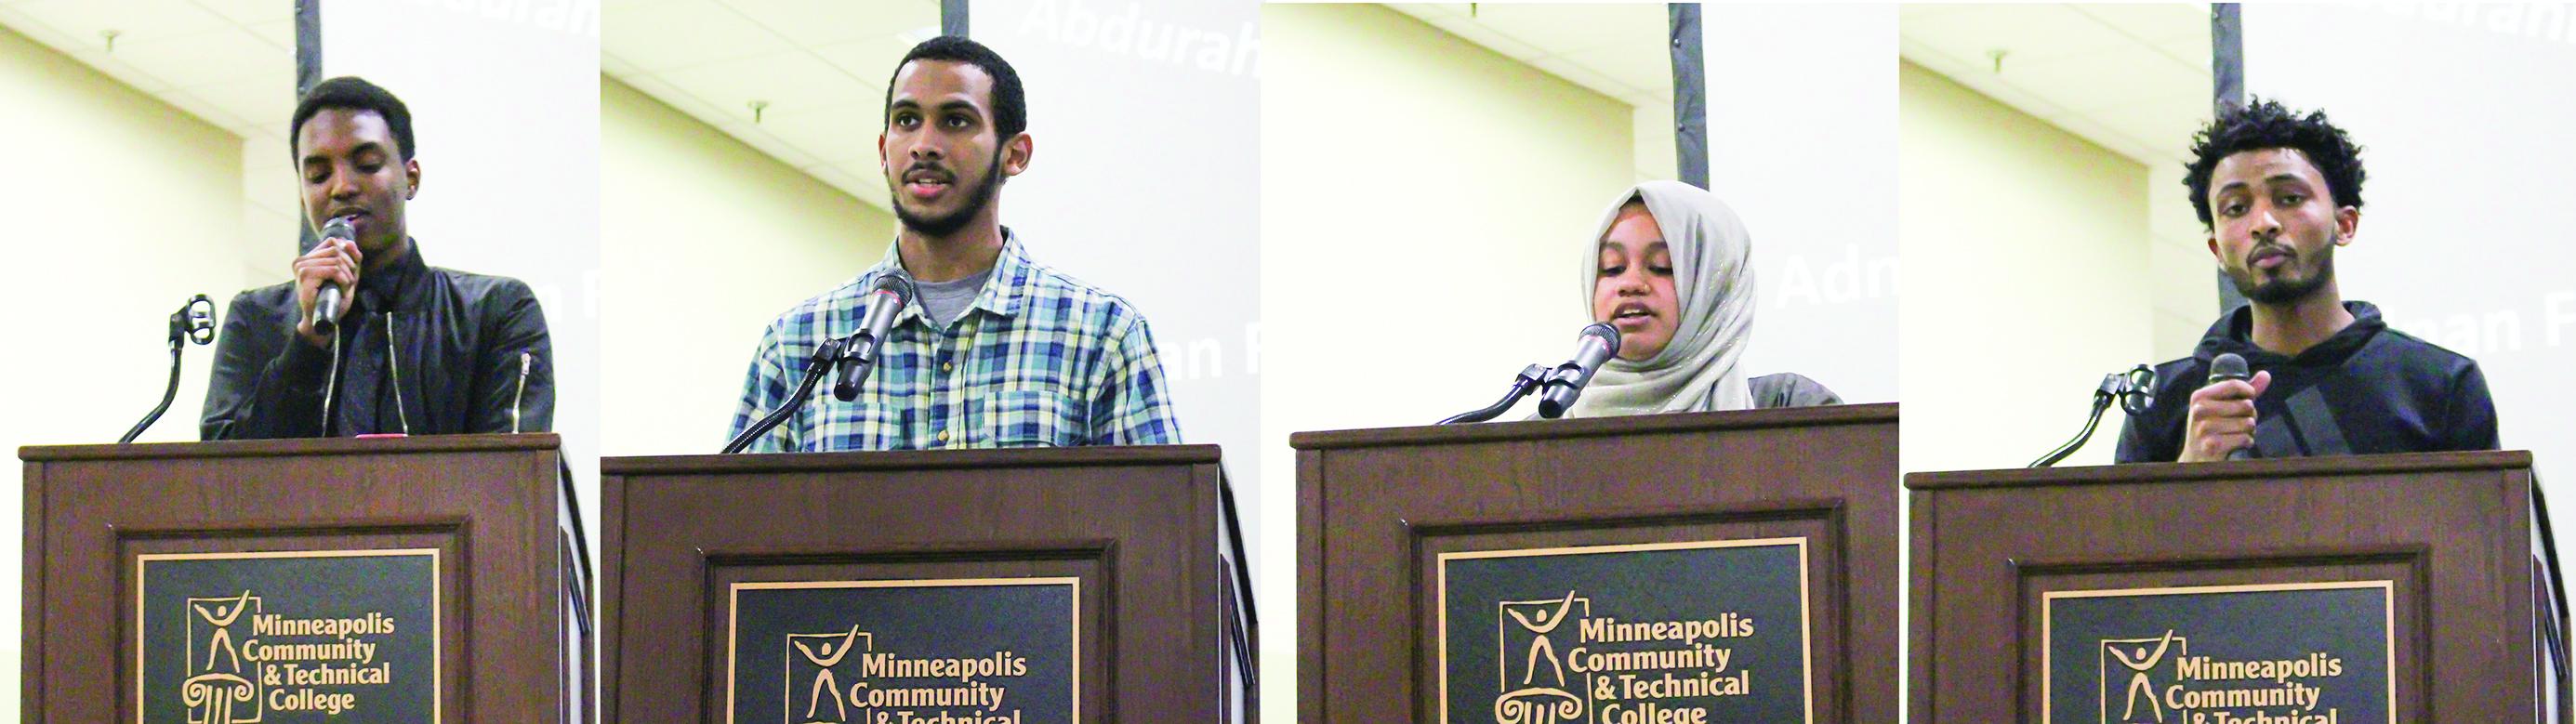 MSA celebrates Malcolm X and educates community on Islamophobia & Mass Incarceration